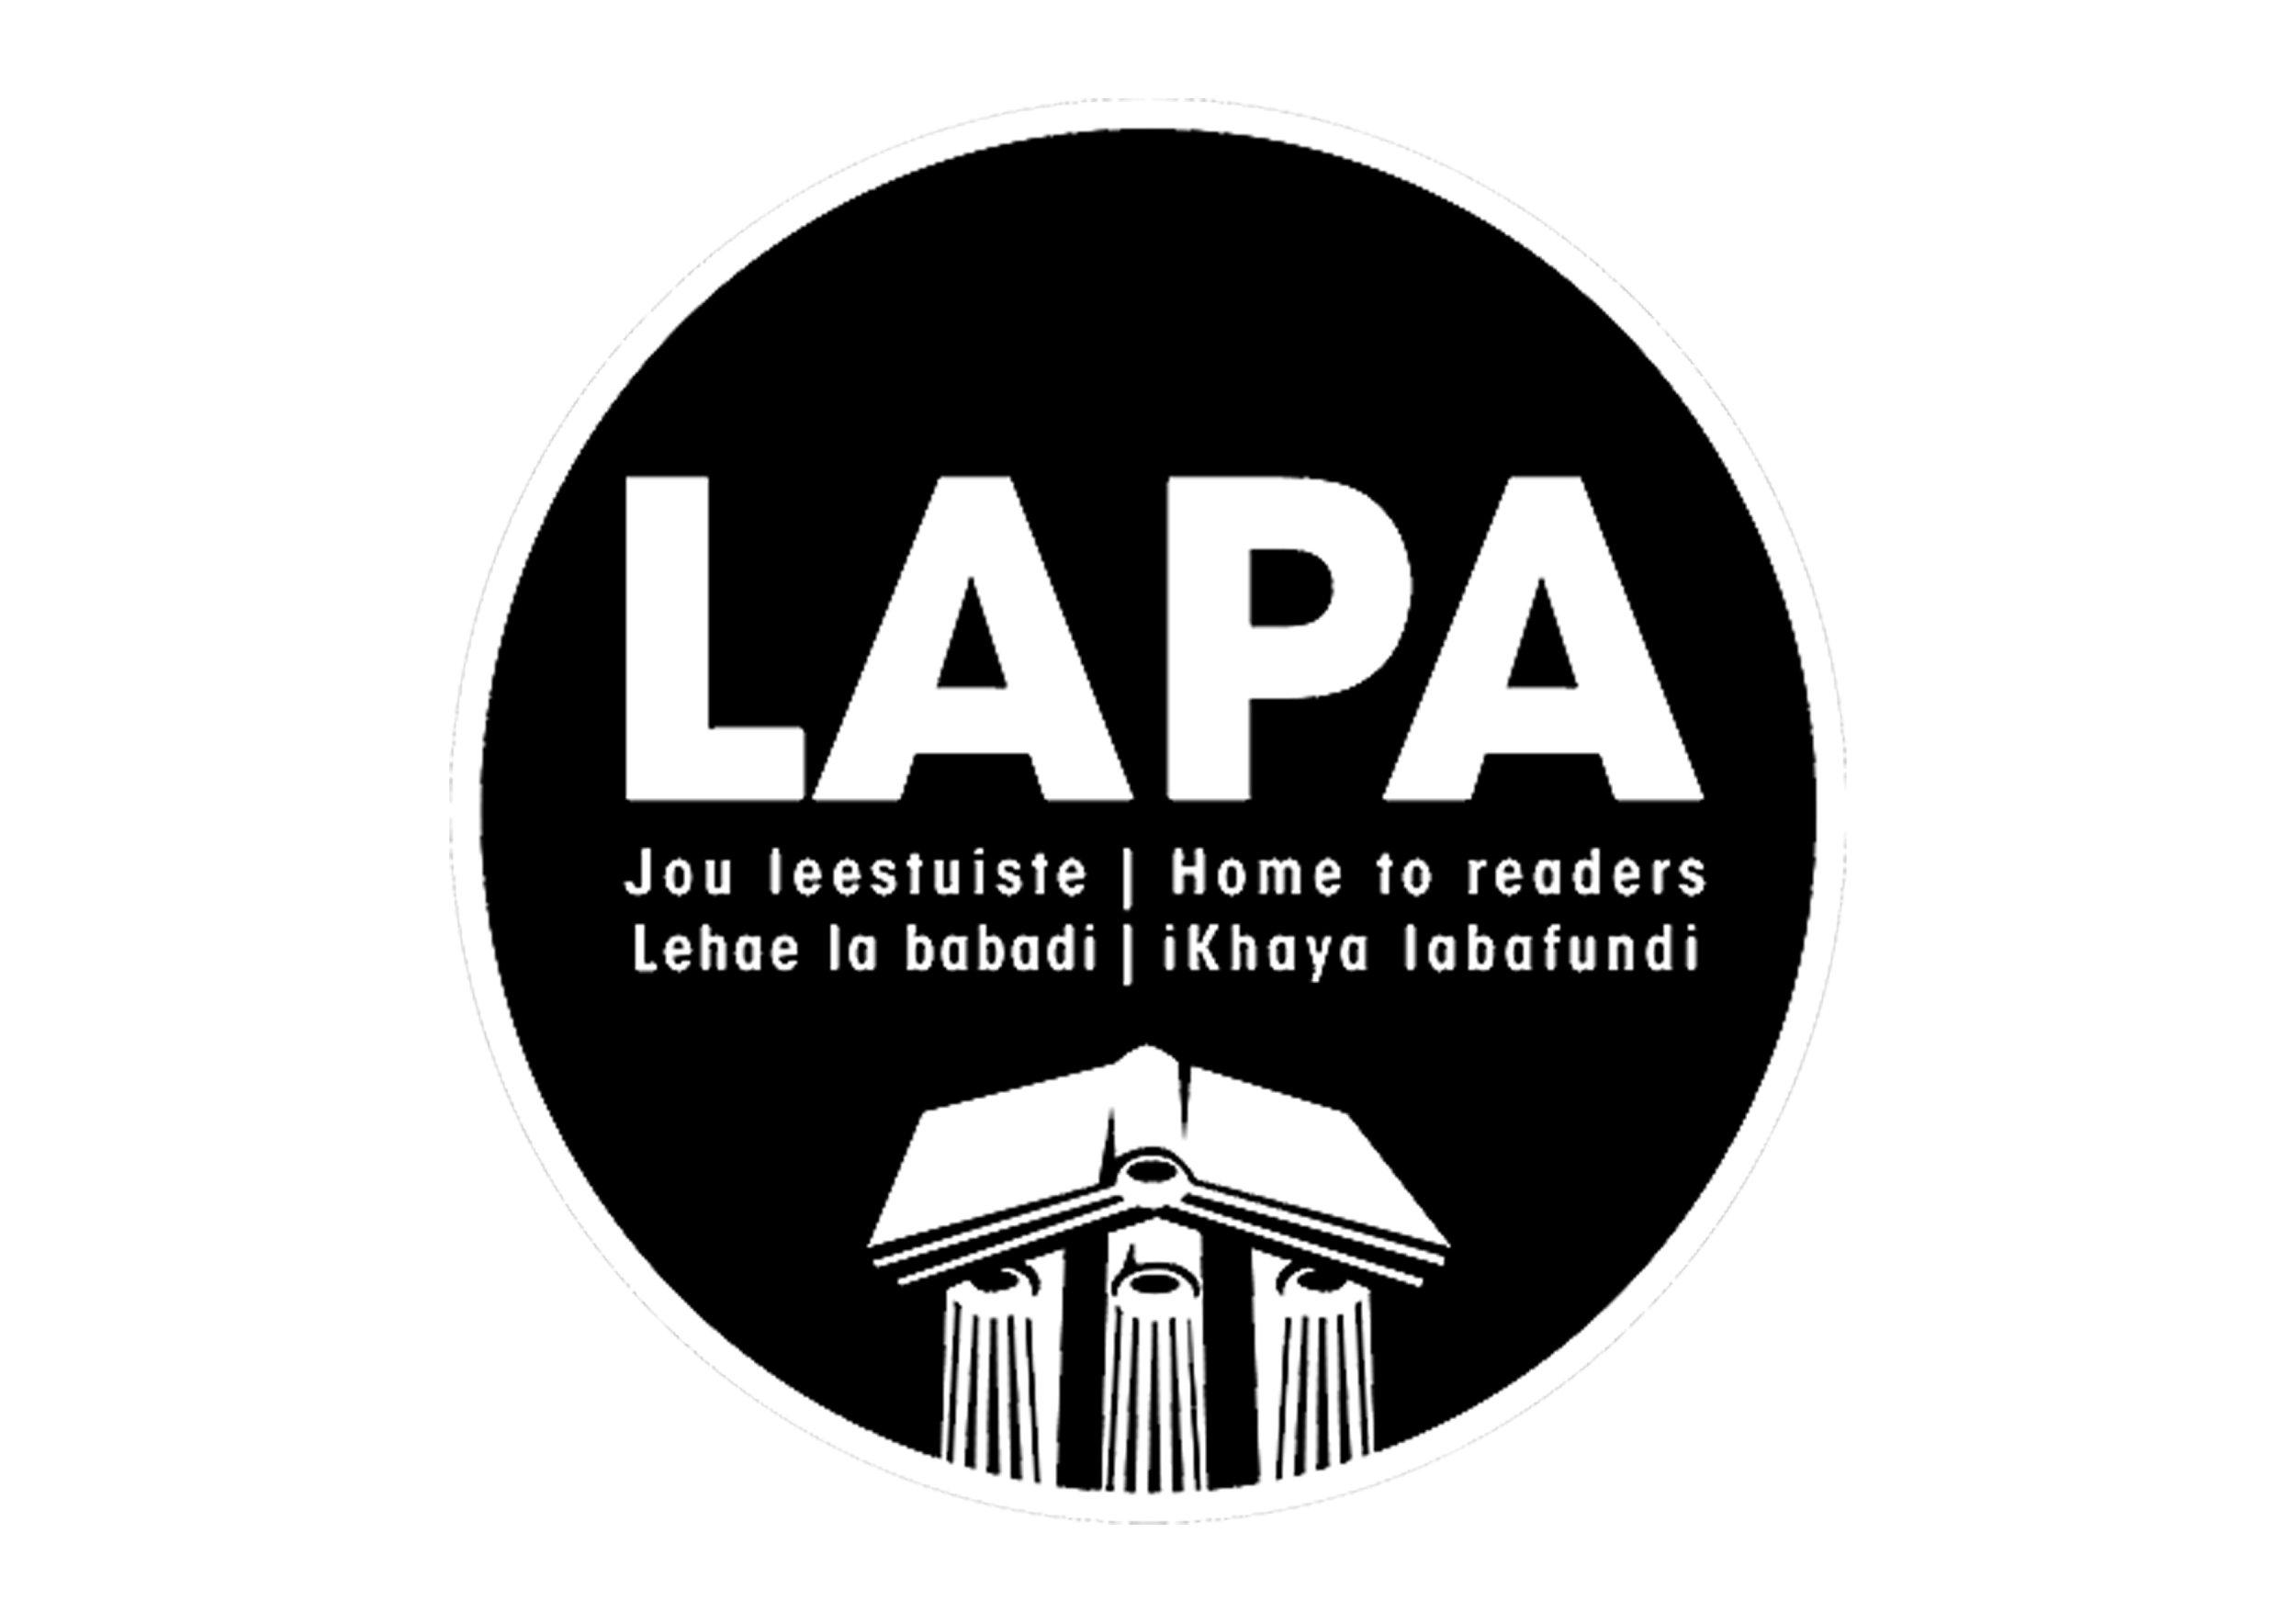 LAPA.jpg